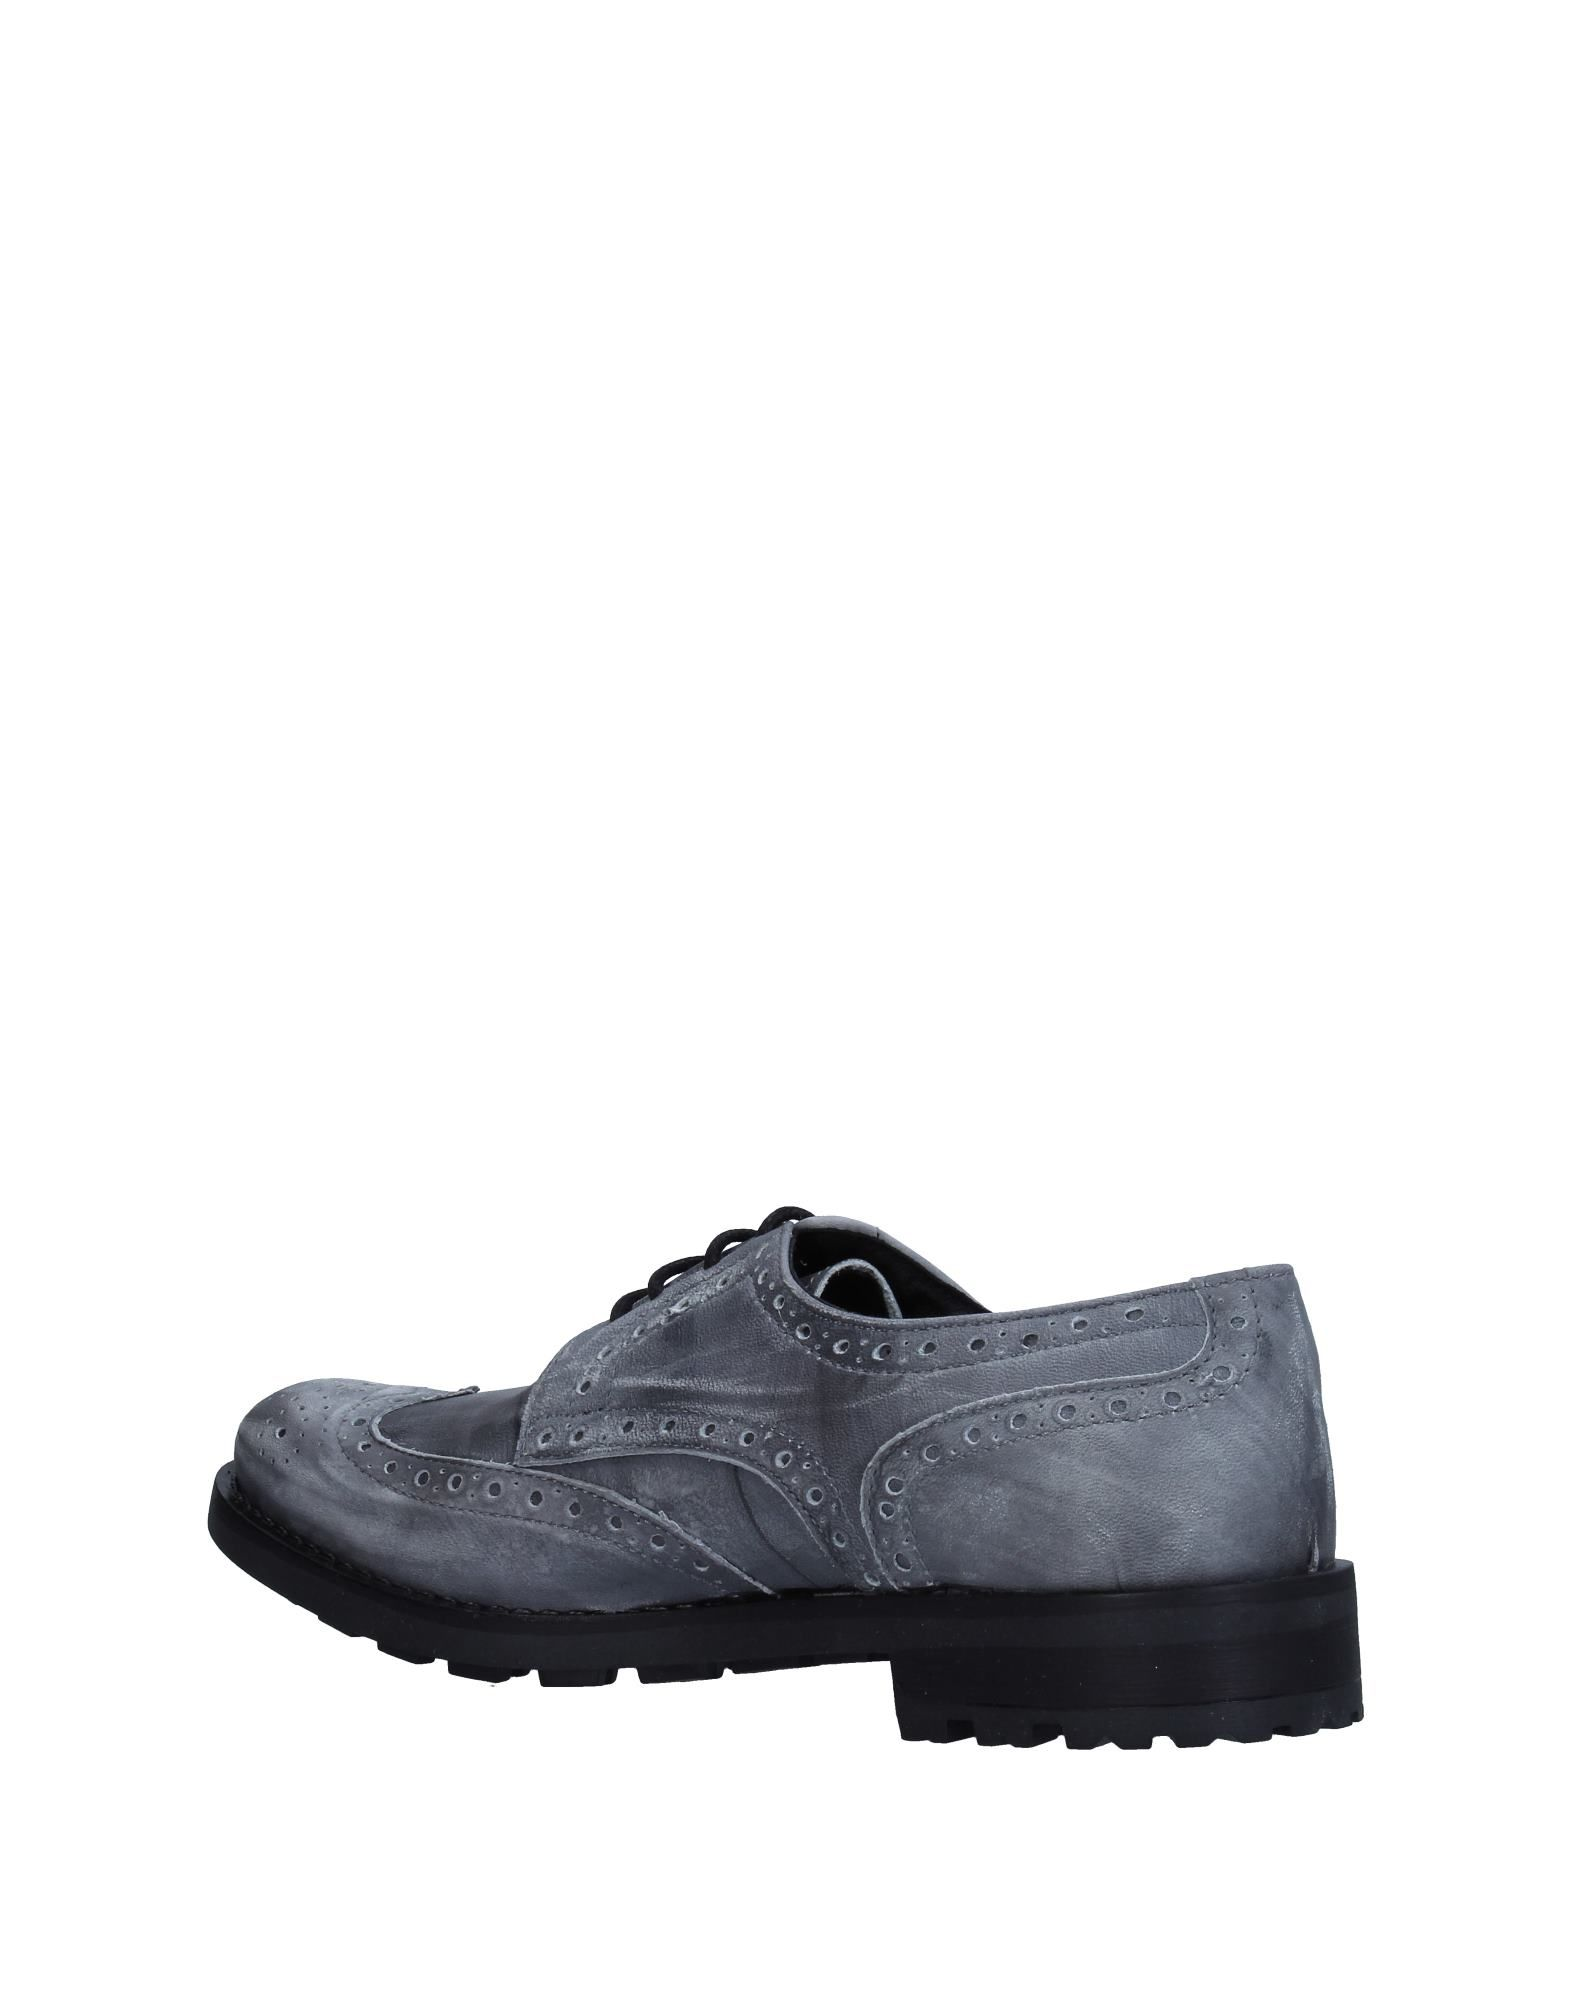 Rieker M6924, Sneakers Basses Femme, Gris (Staub/Steel/Fango-Silver/Perle-Silber/42), 36 EU